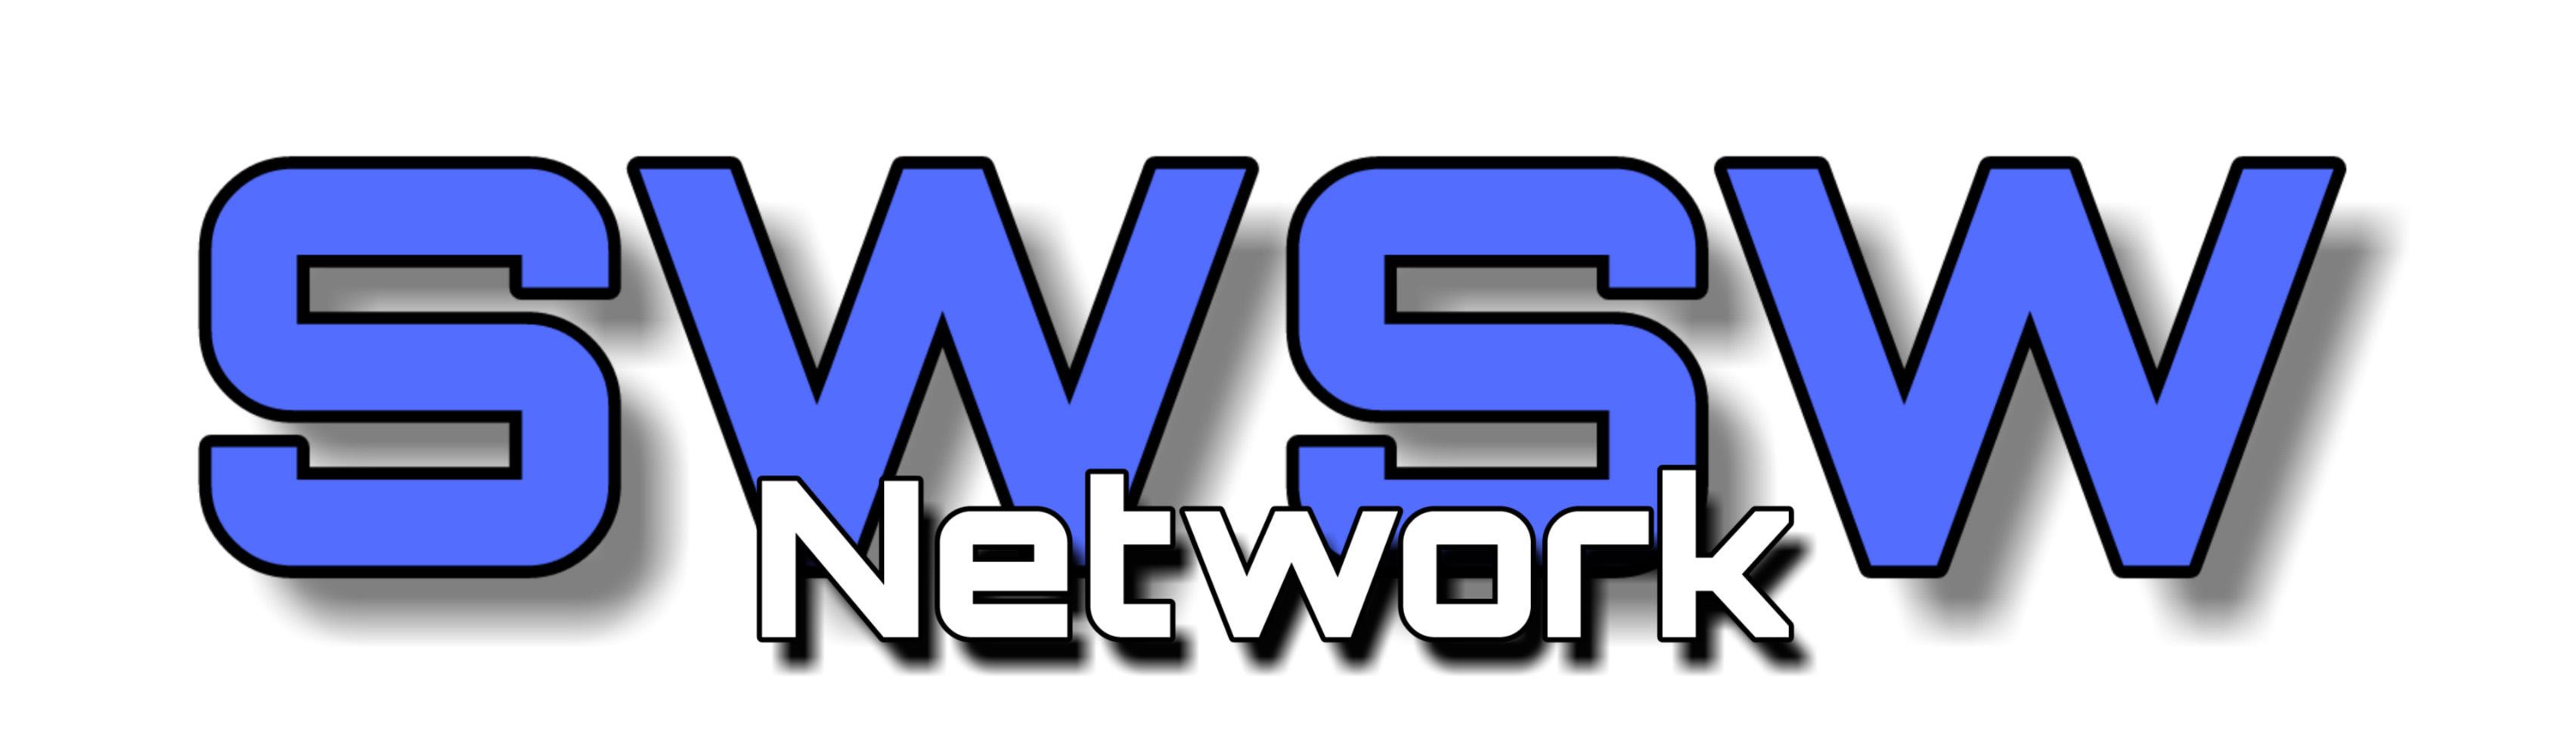 SWSW Network